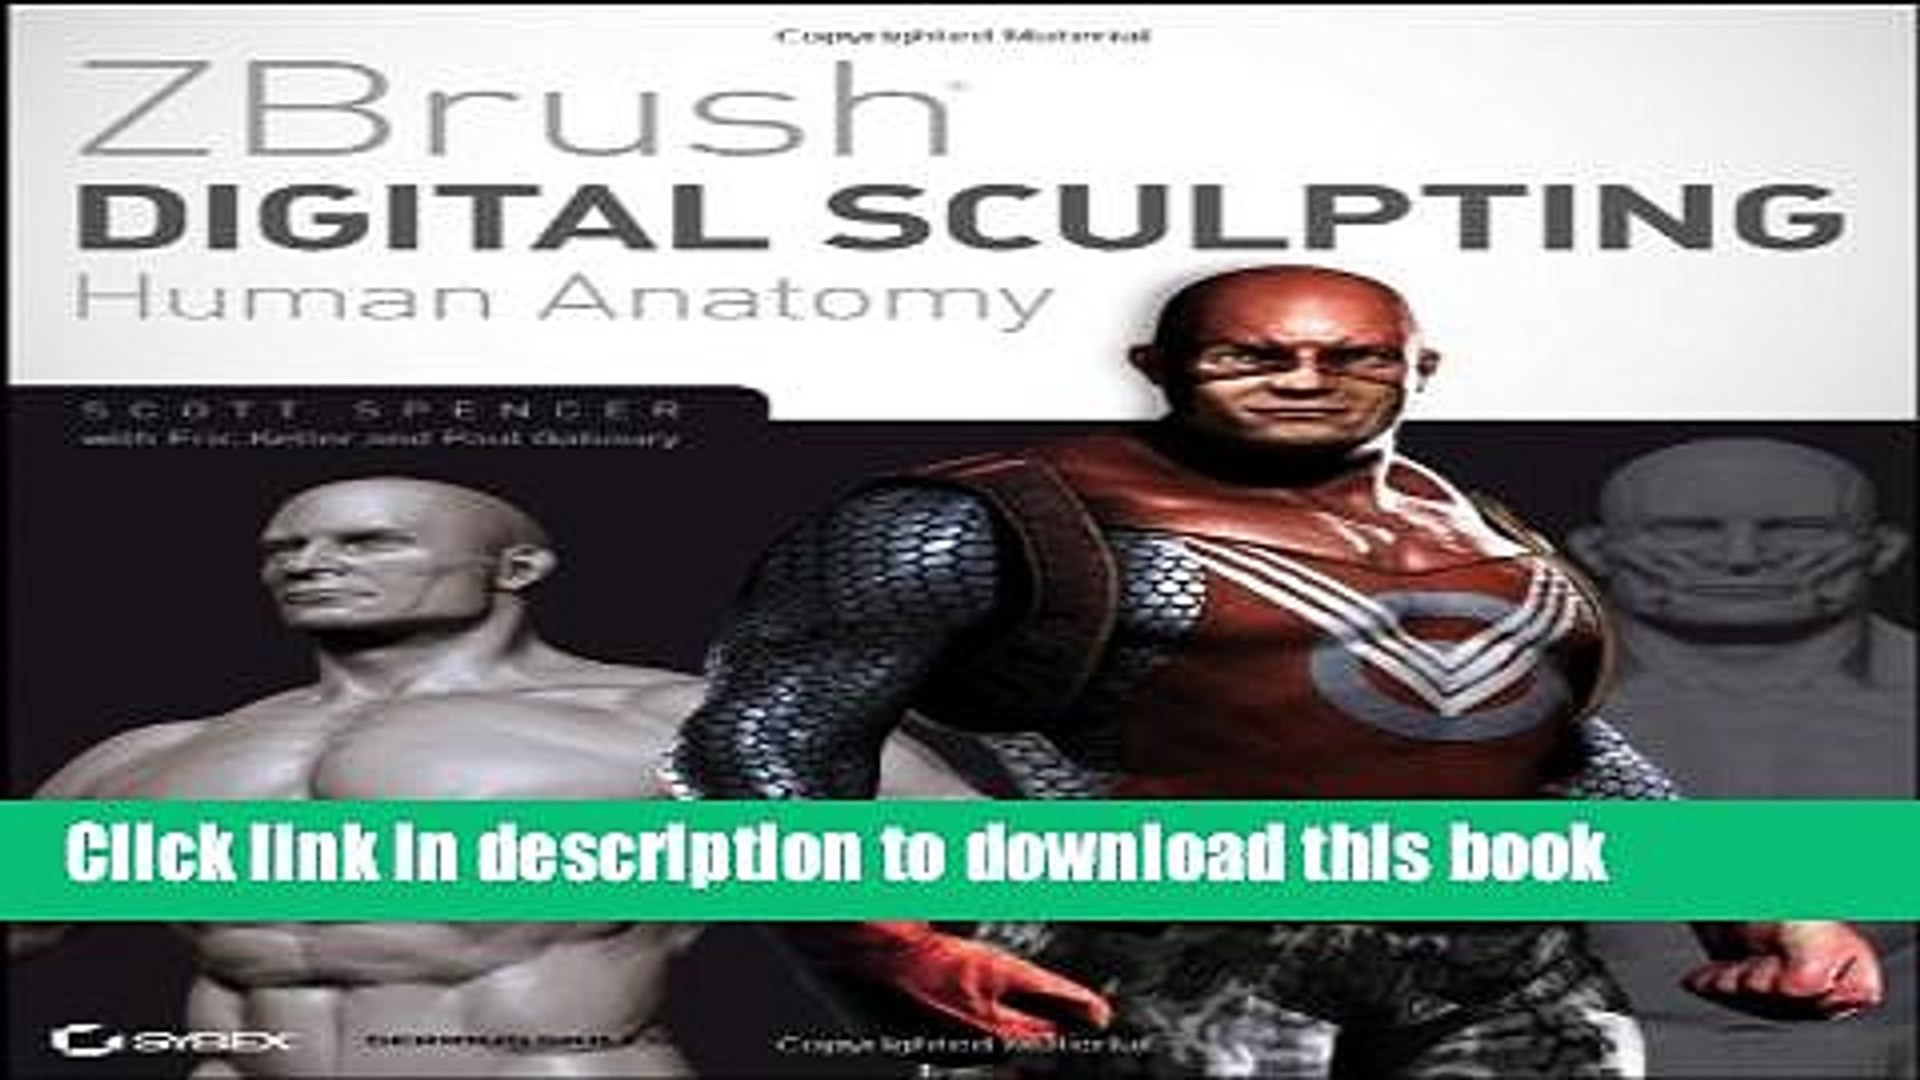 zbrush digital sculpting human anatomy pdf free download